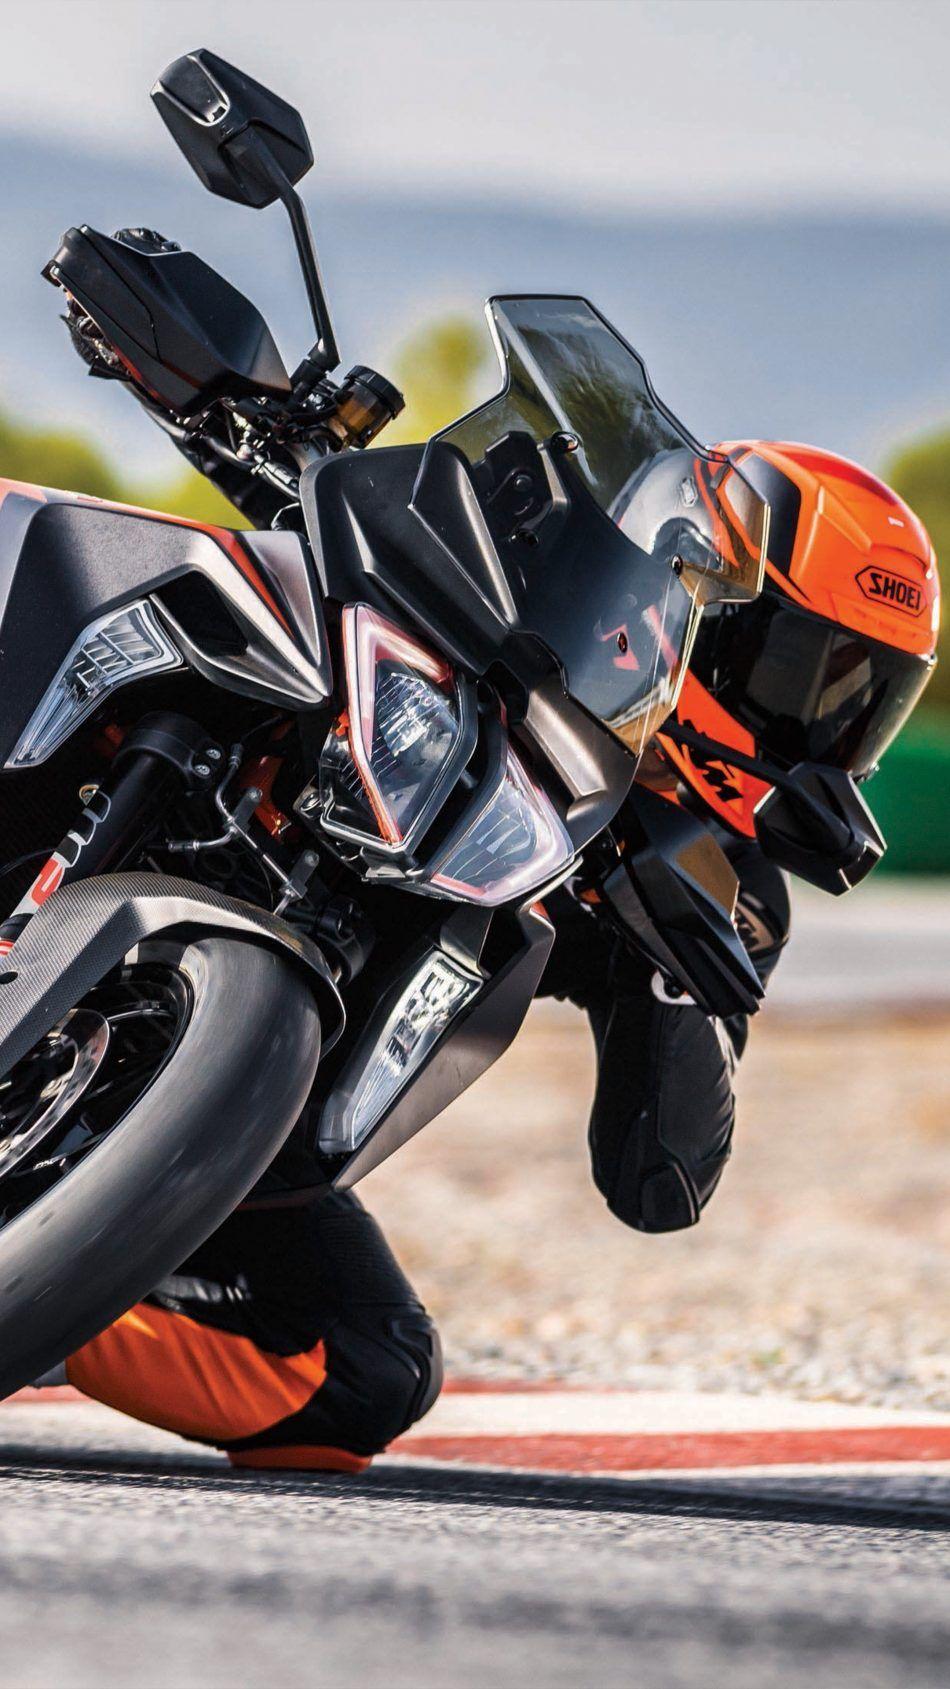 Ktm 1290 Super Duke Gt 2019 Ktm Ktm Super Duke Bike